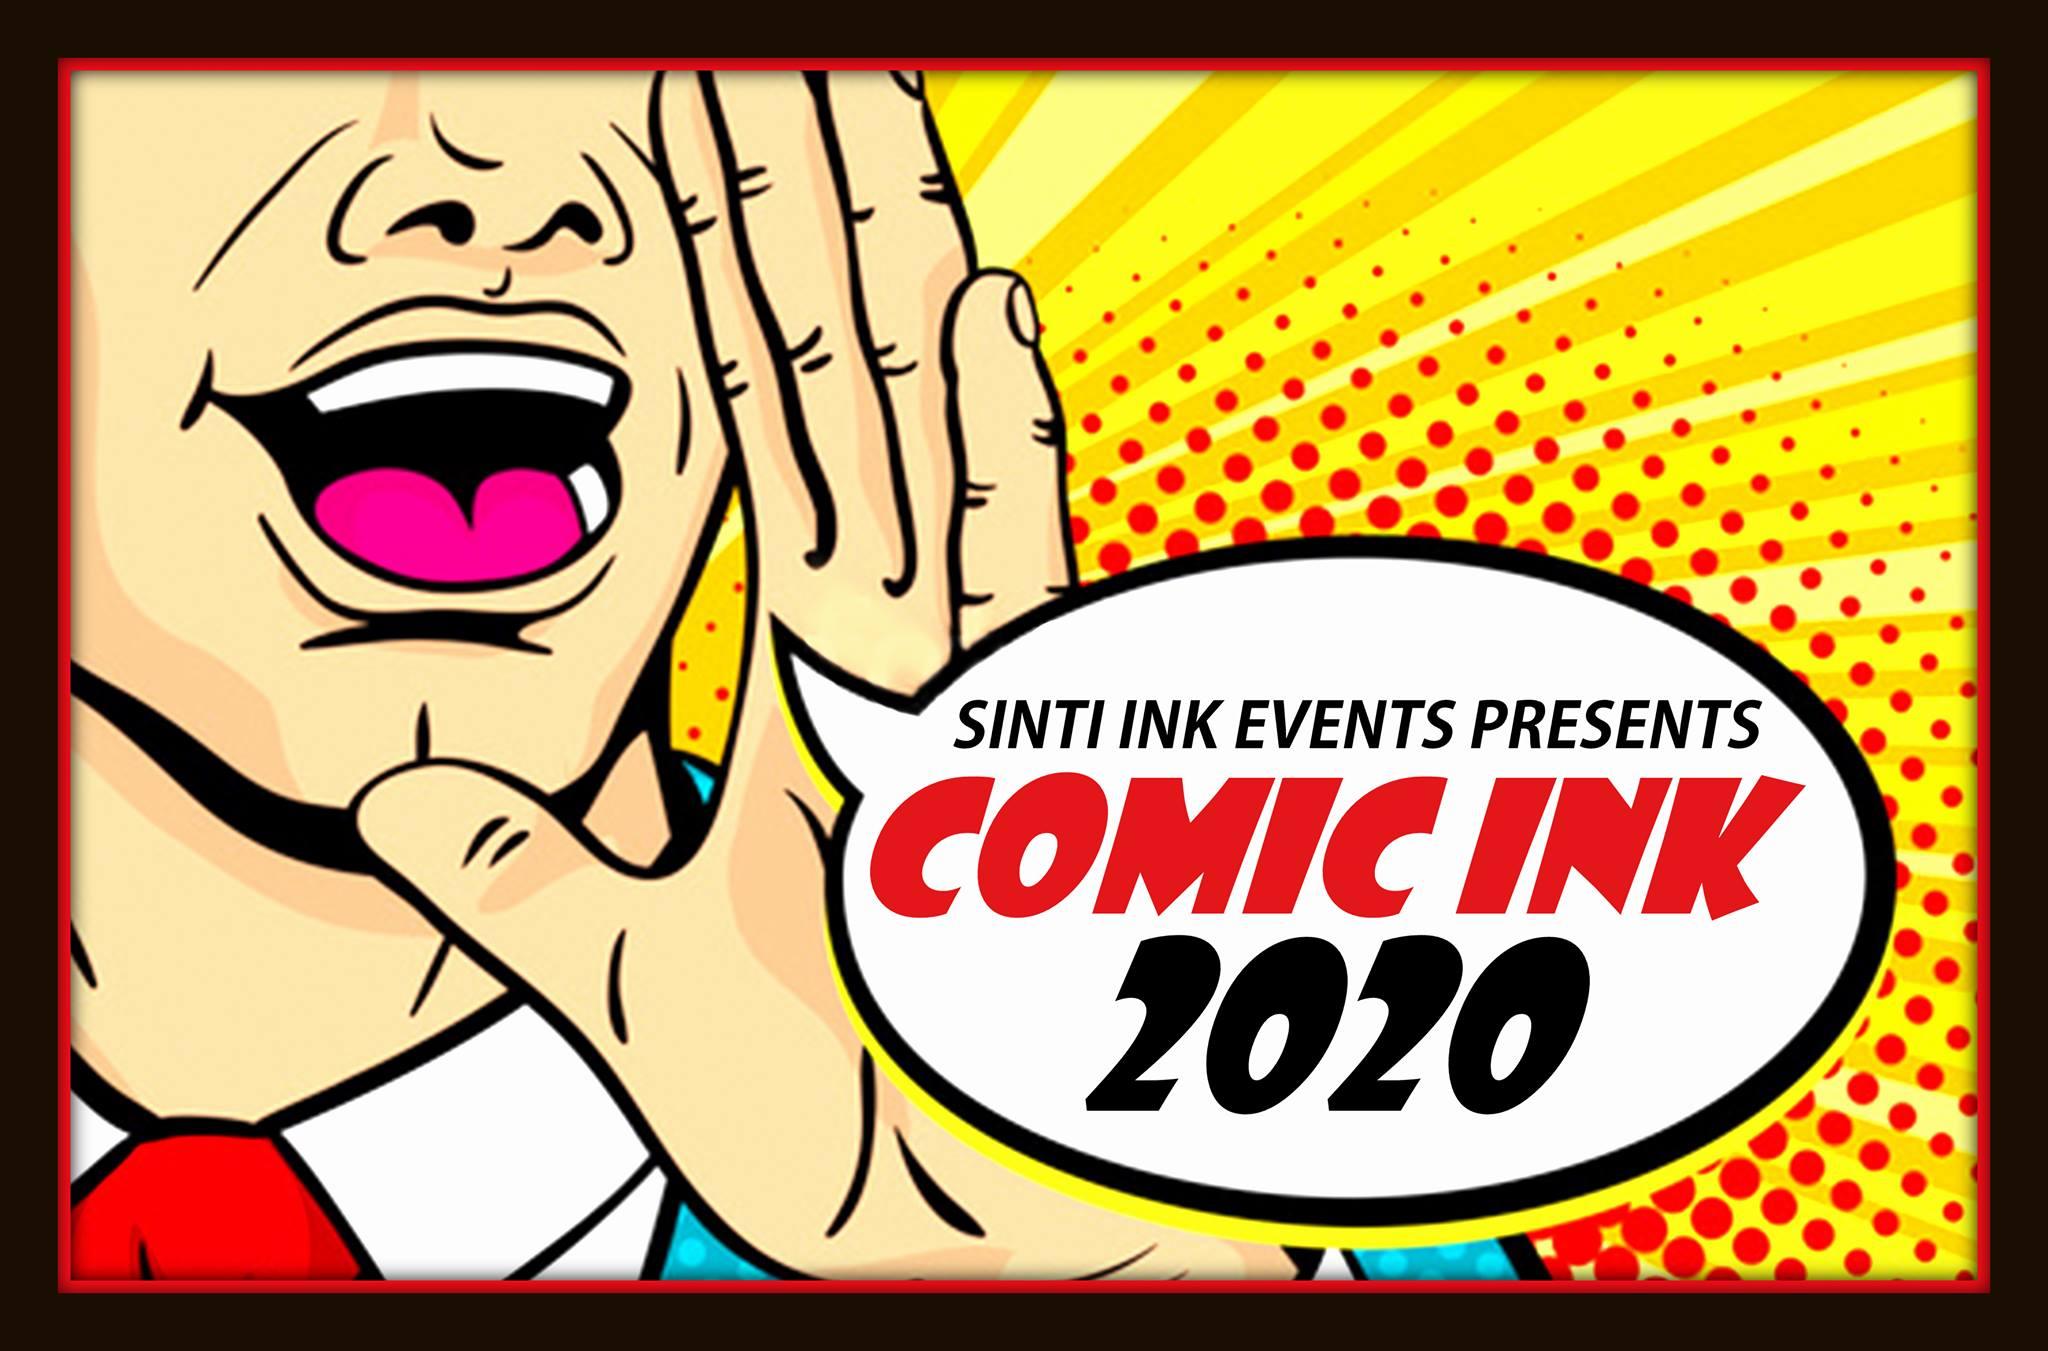 Evenementen Sinti Ink Tattoo Studio